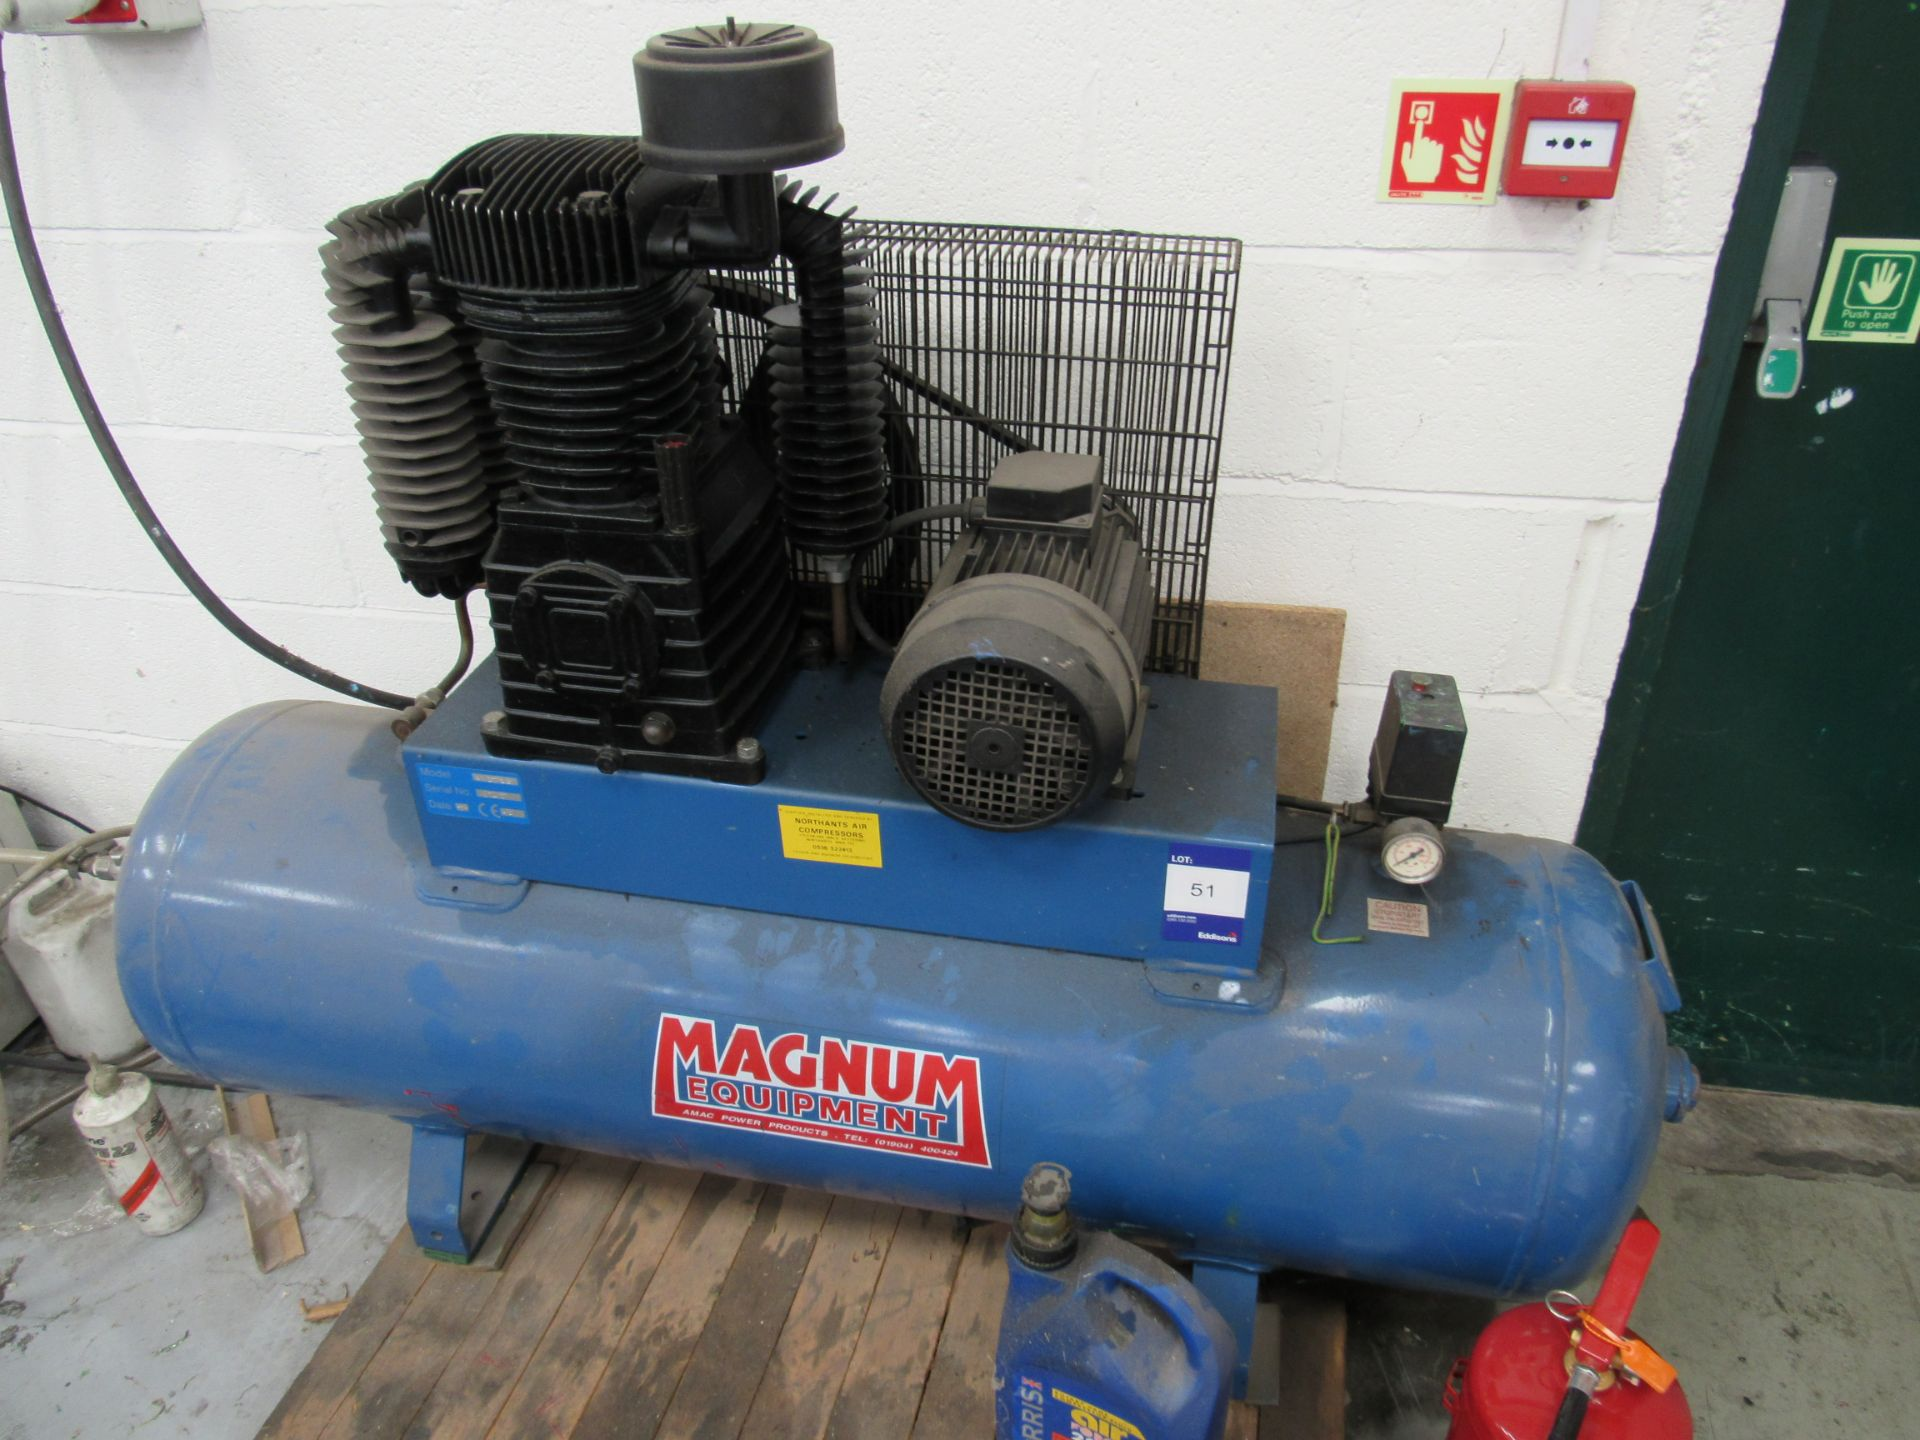 Magnum SX27/240 Receiver Mounted Compressor Serial Number 8745, 1995 - Image 2 of 4